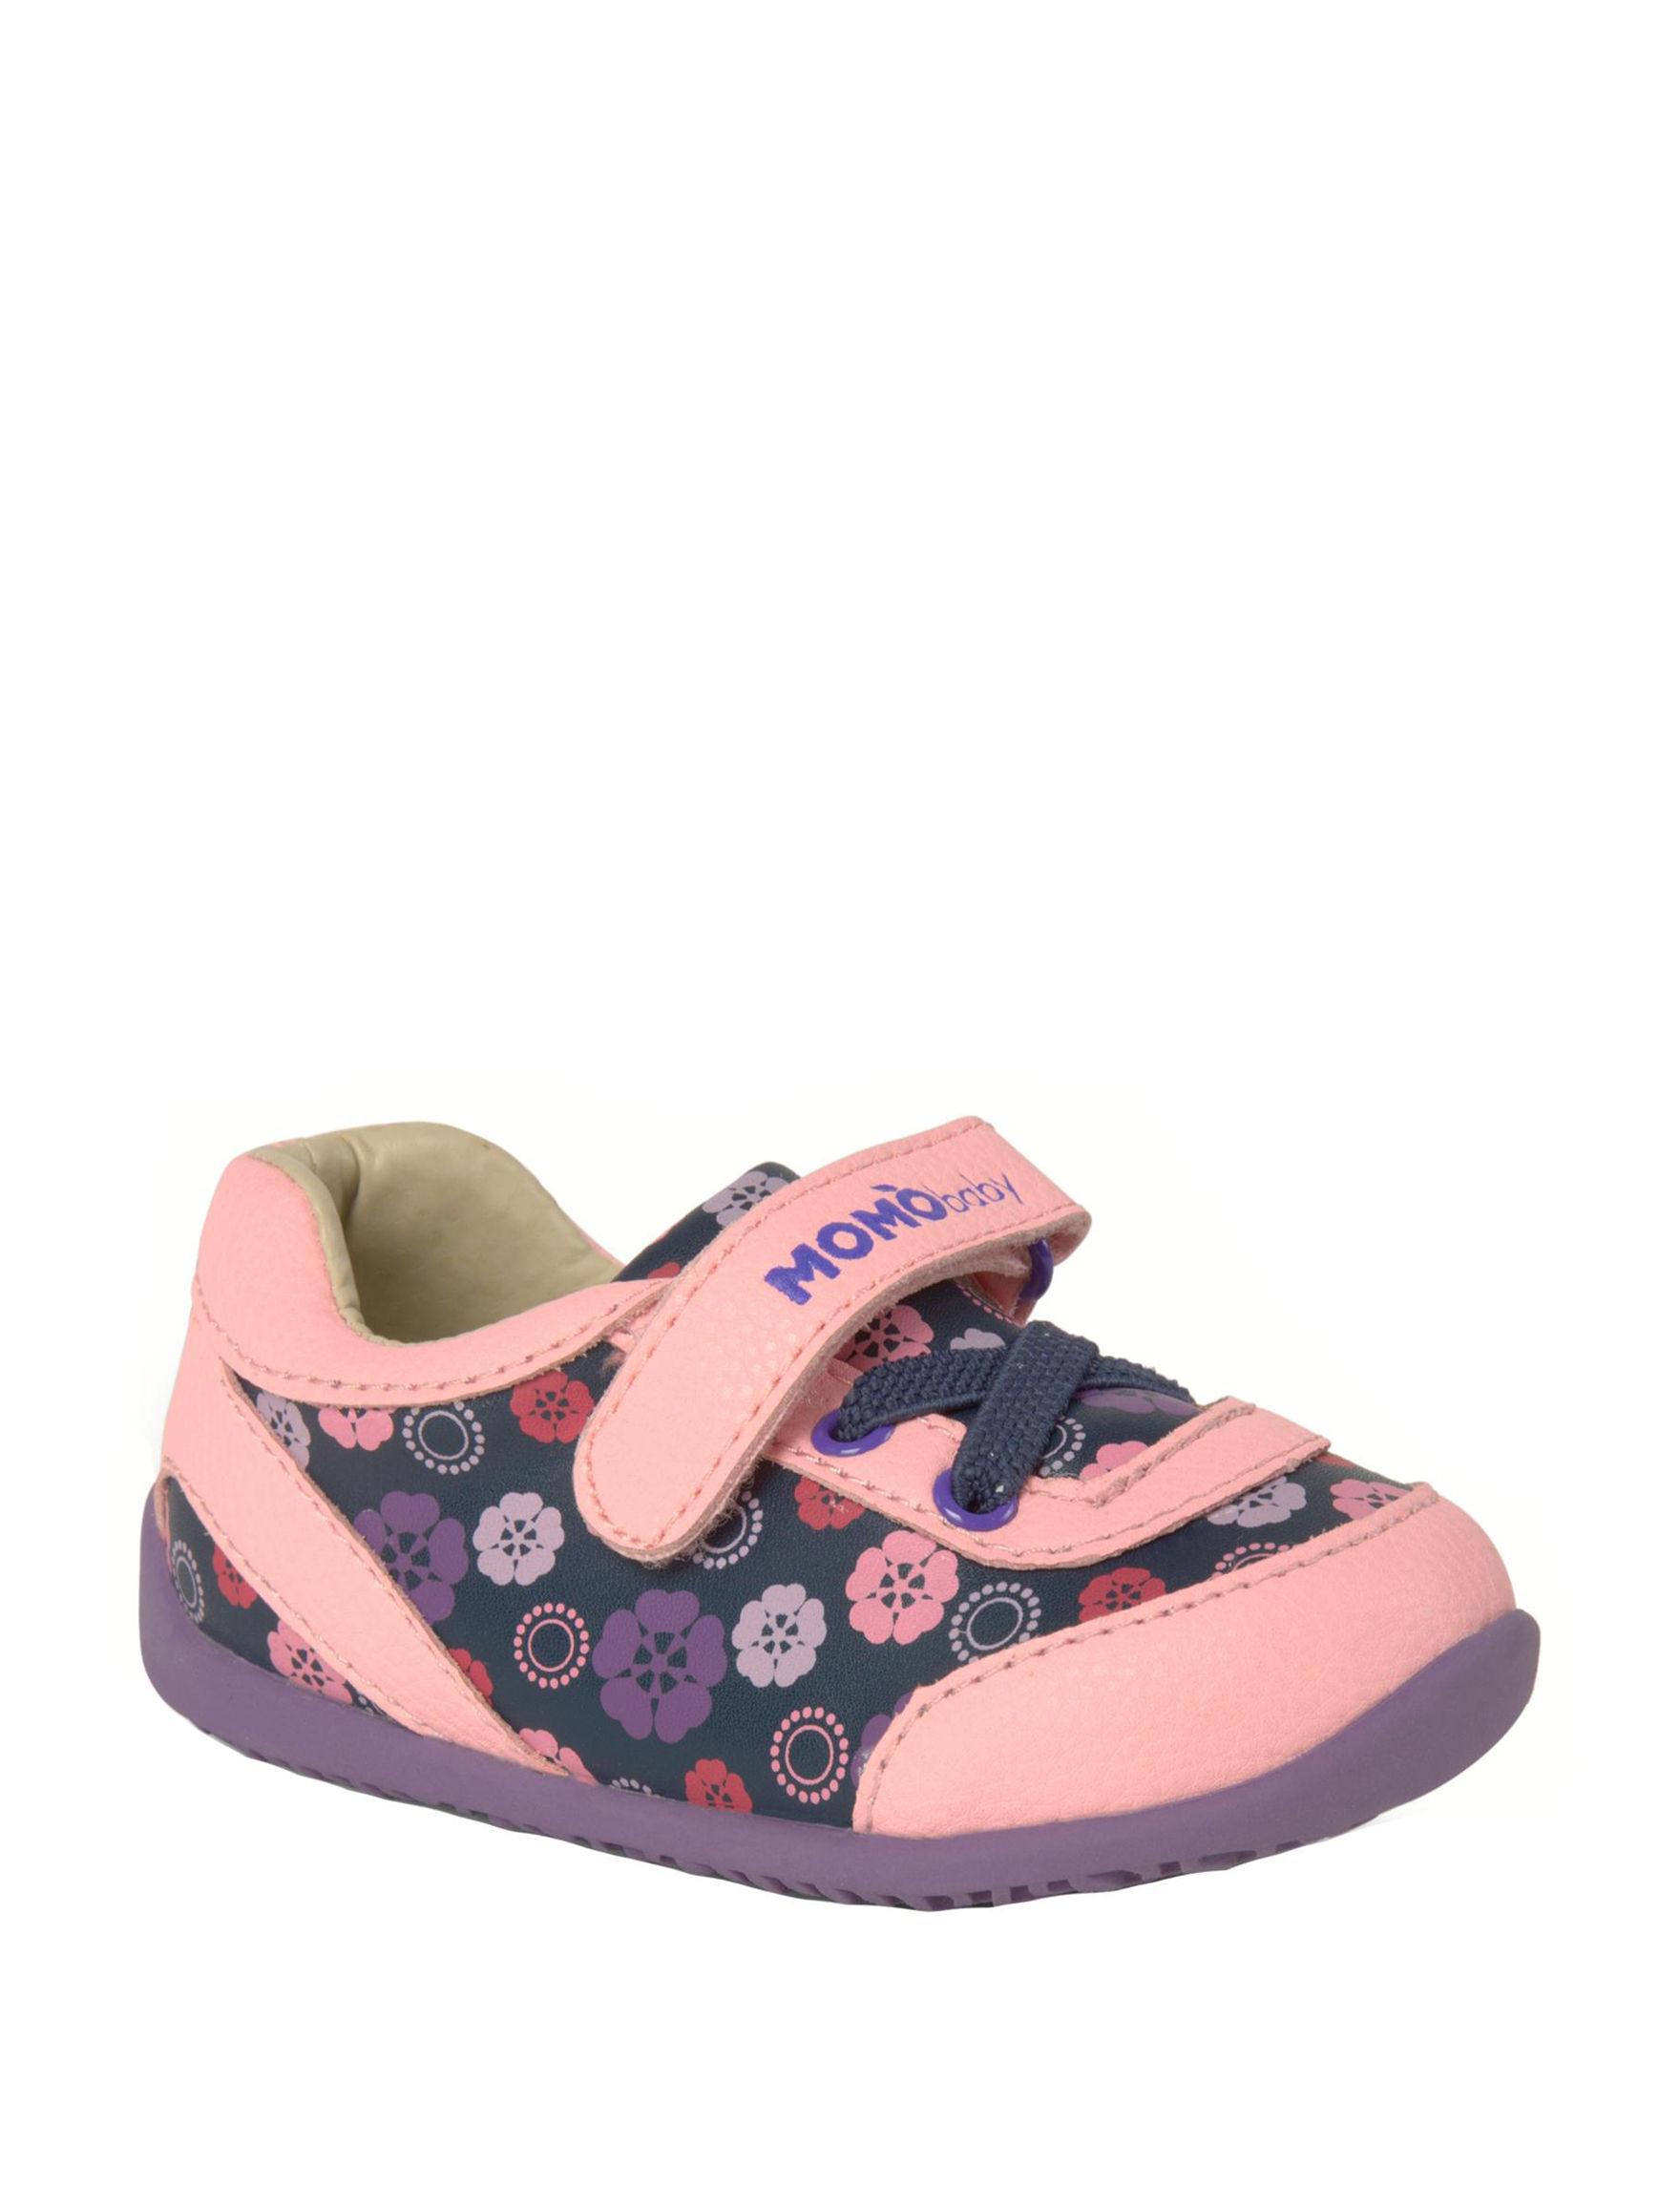 Momo Baby Purple / Pink